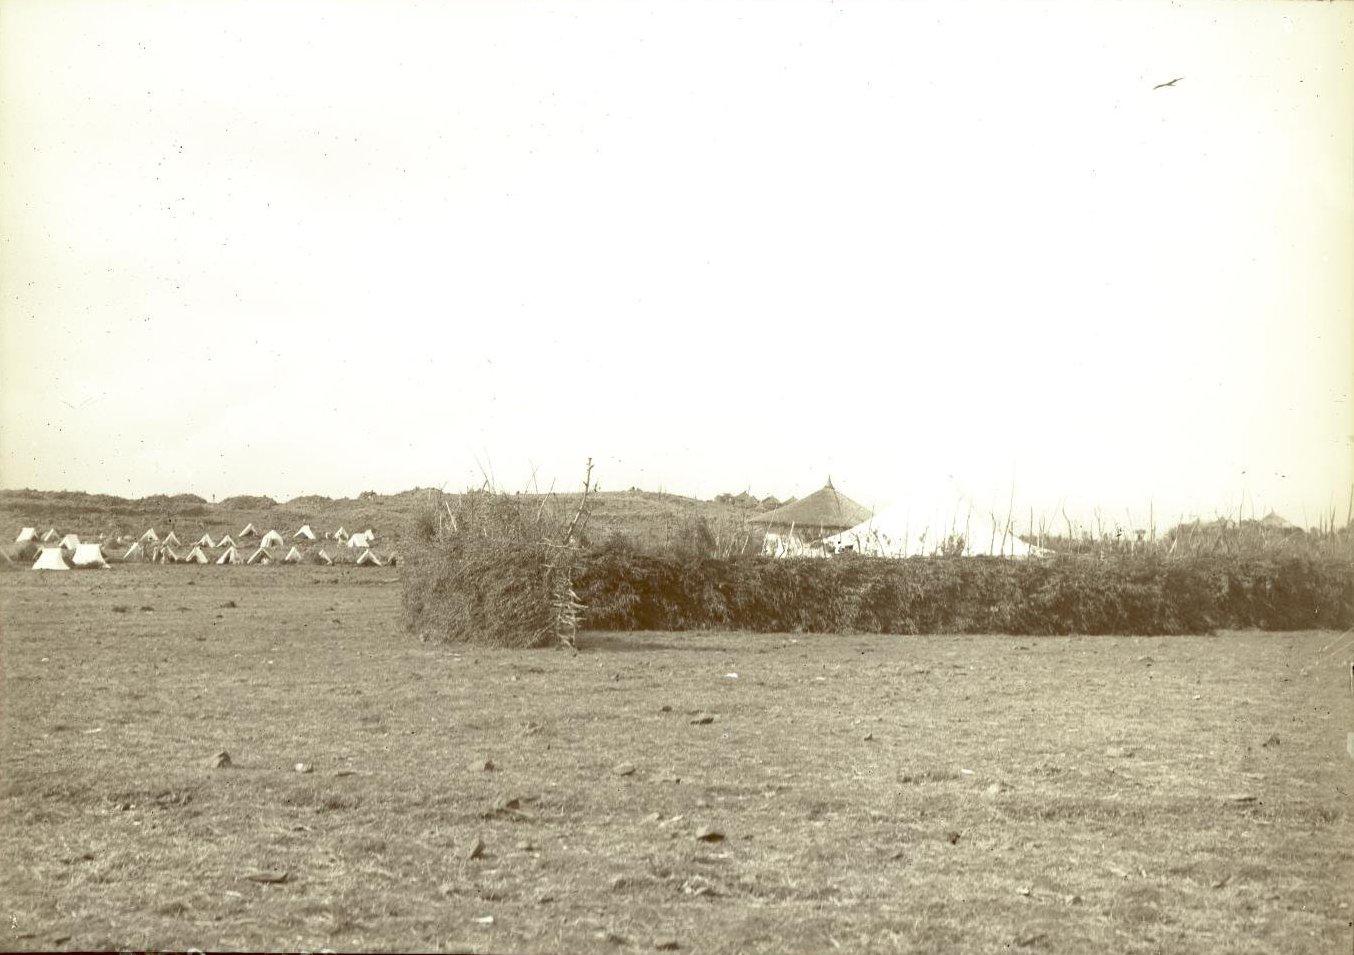 334. 1899. Абиссиния. г. Аддис-Абеба. Бульга. ставка императора Менелика